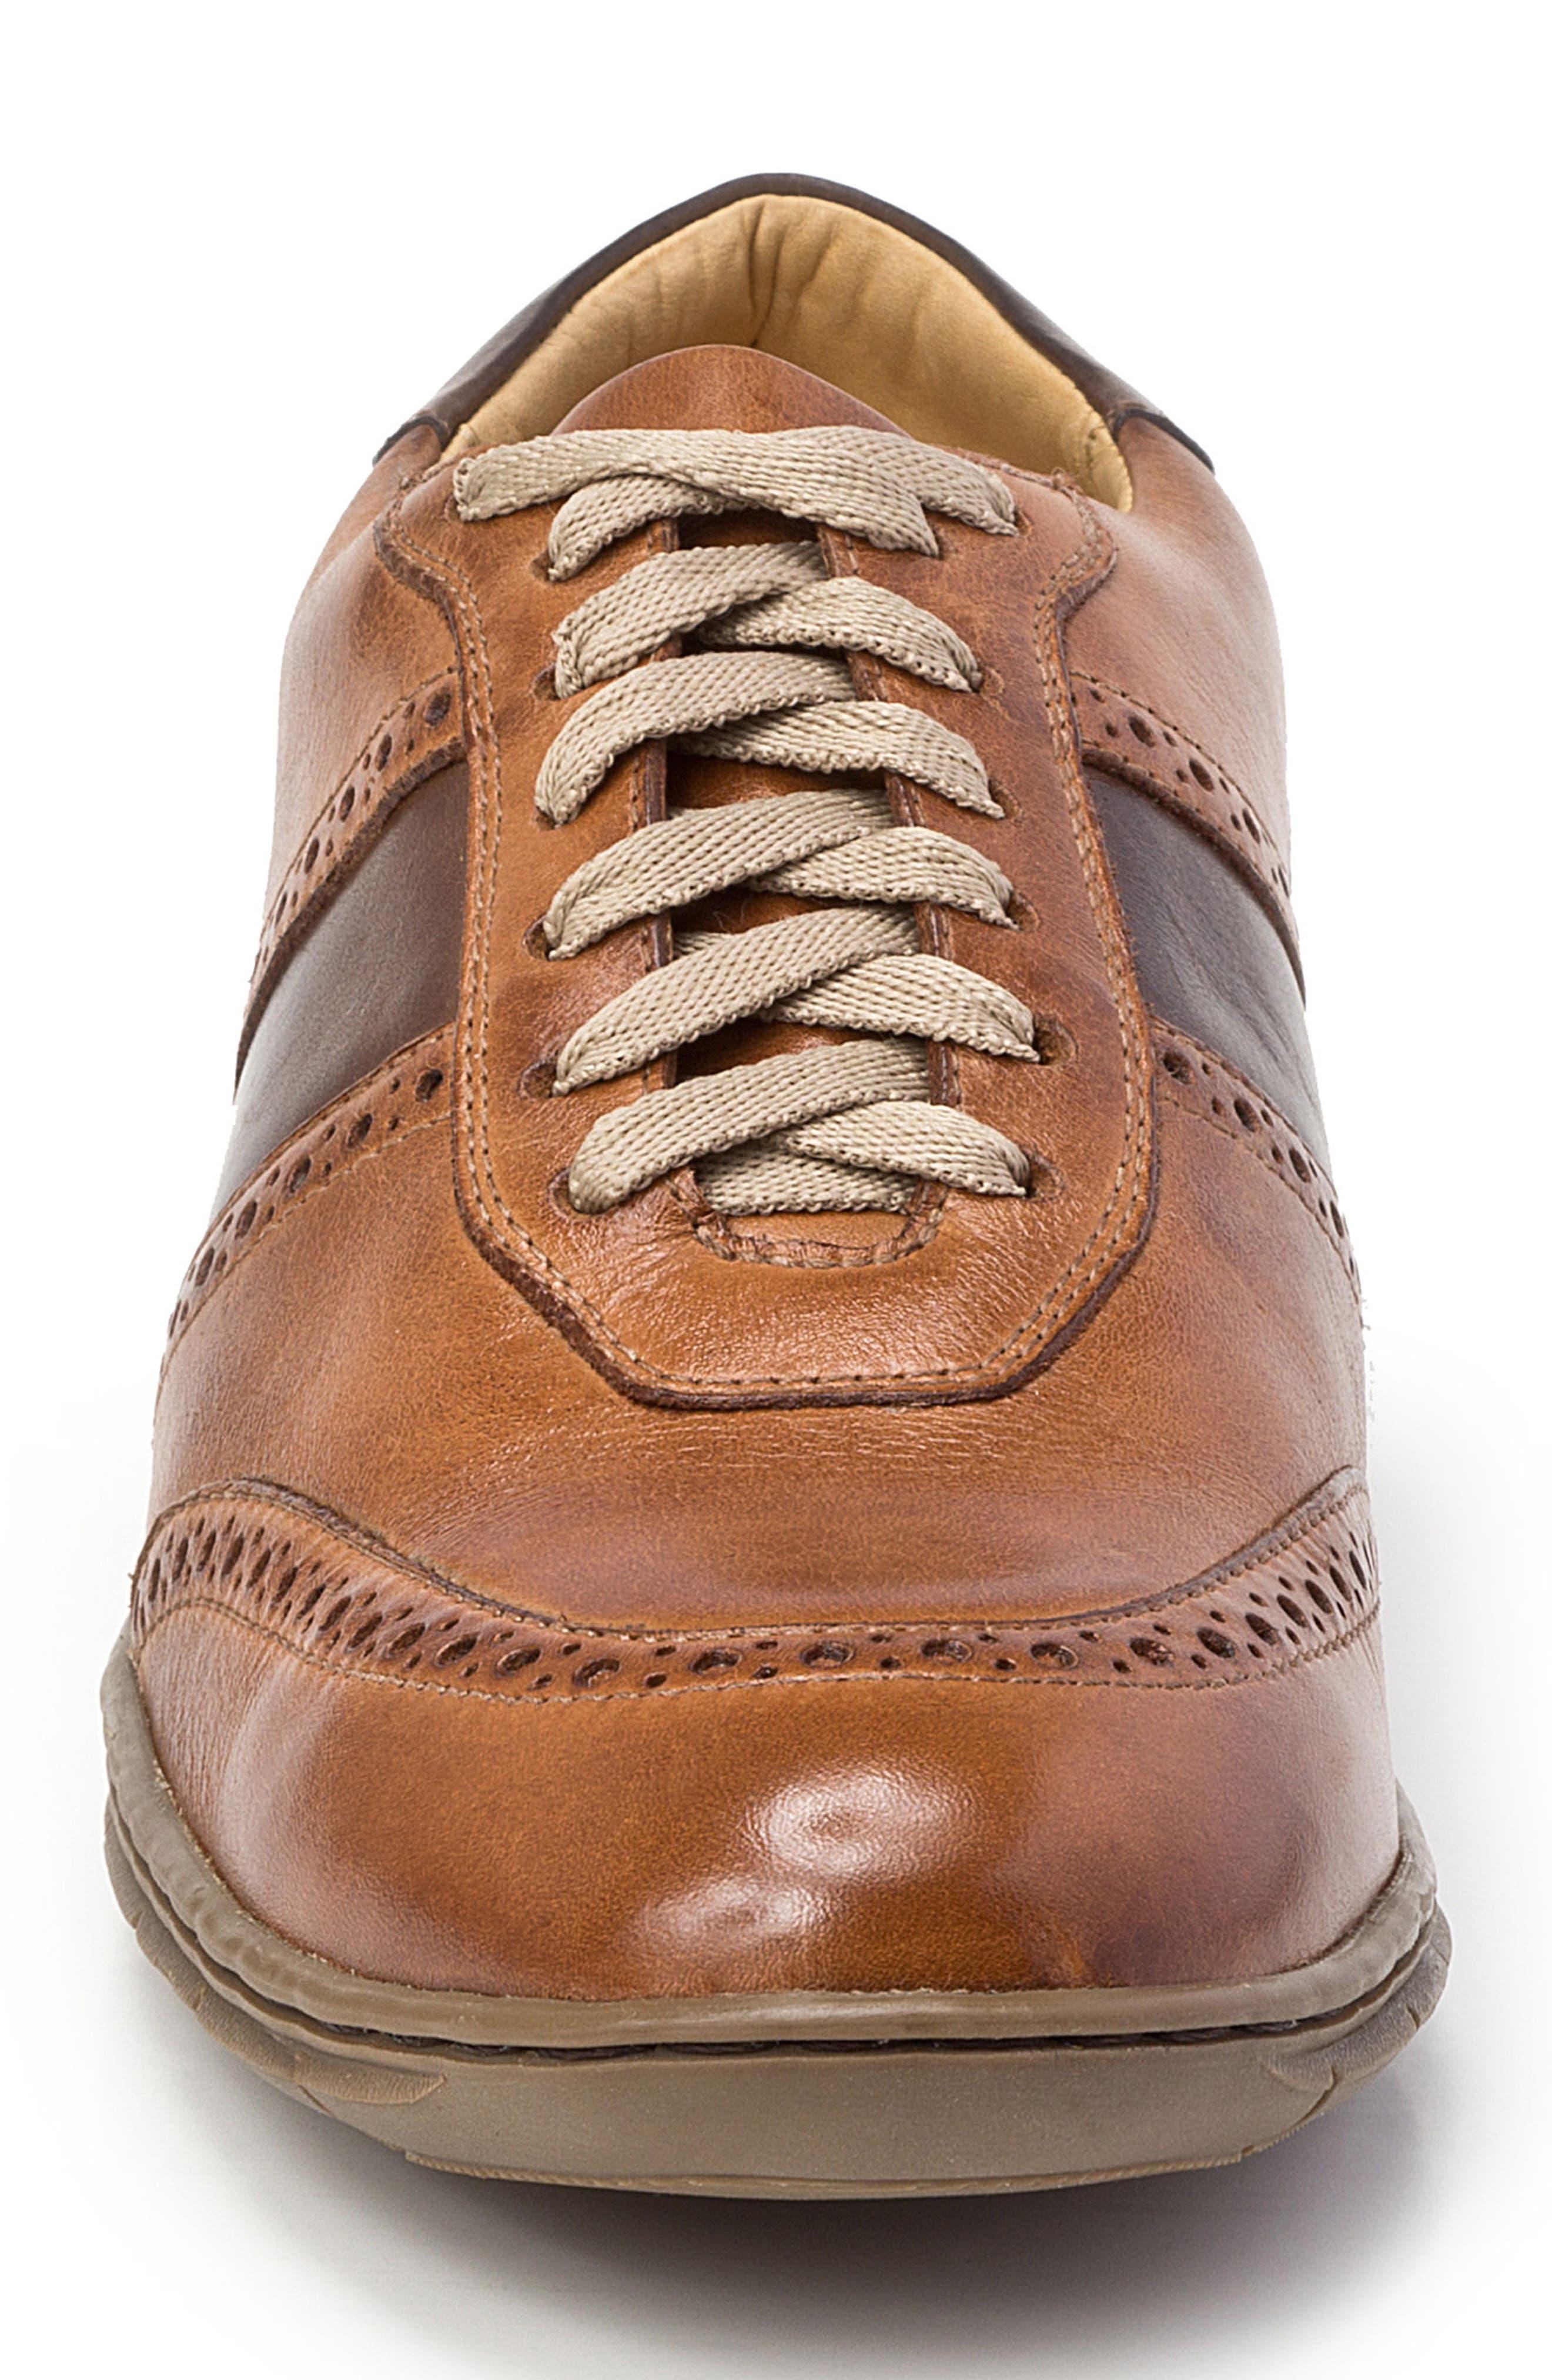 Norris Sneaker,                             Alternate thumbnail 4, color,                             TAN LEATHER